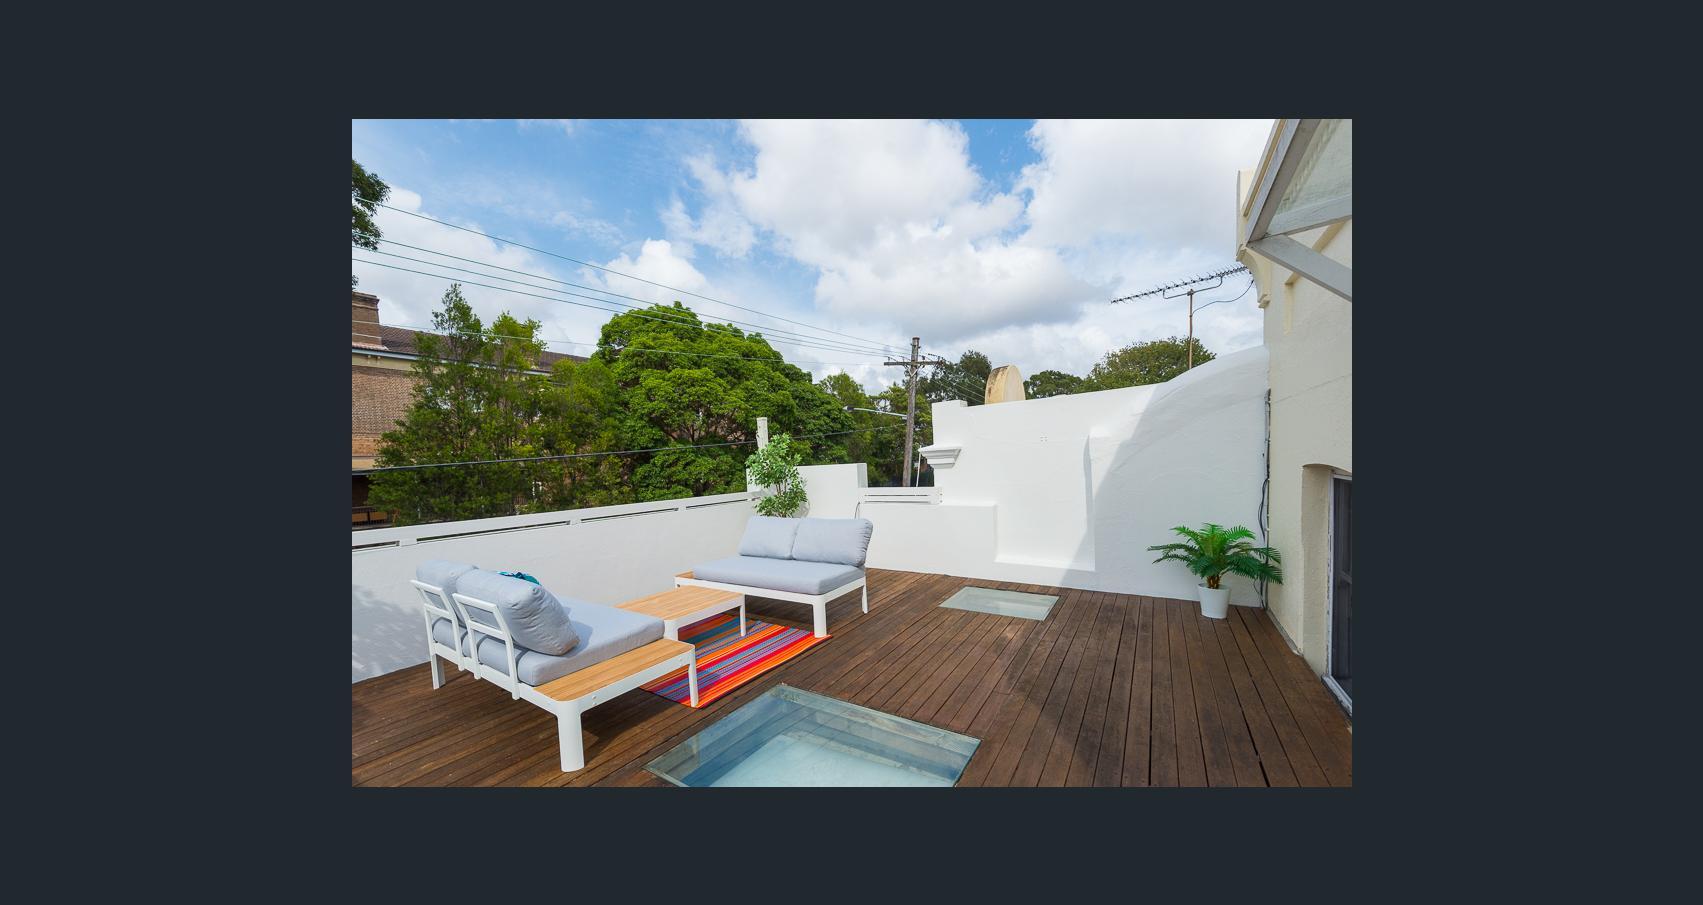 37 Junction roof deck 1